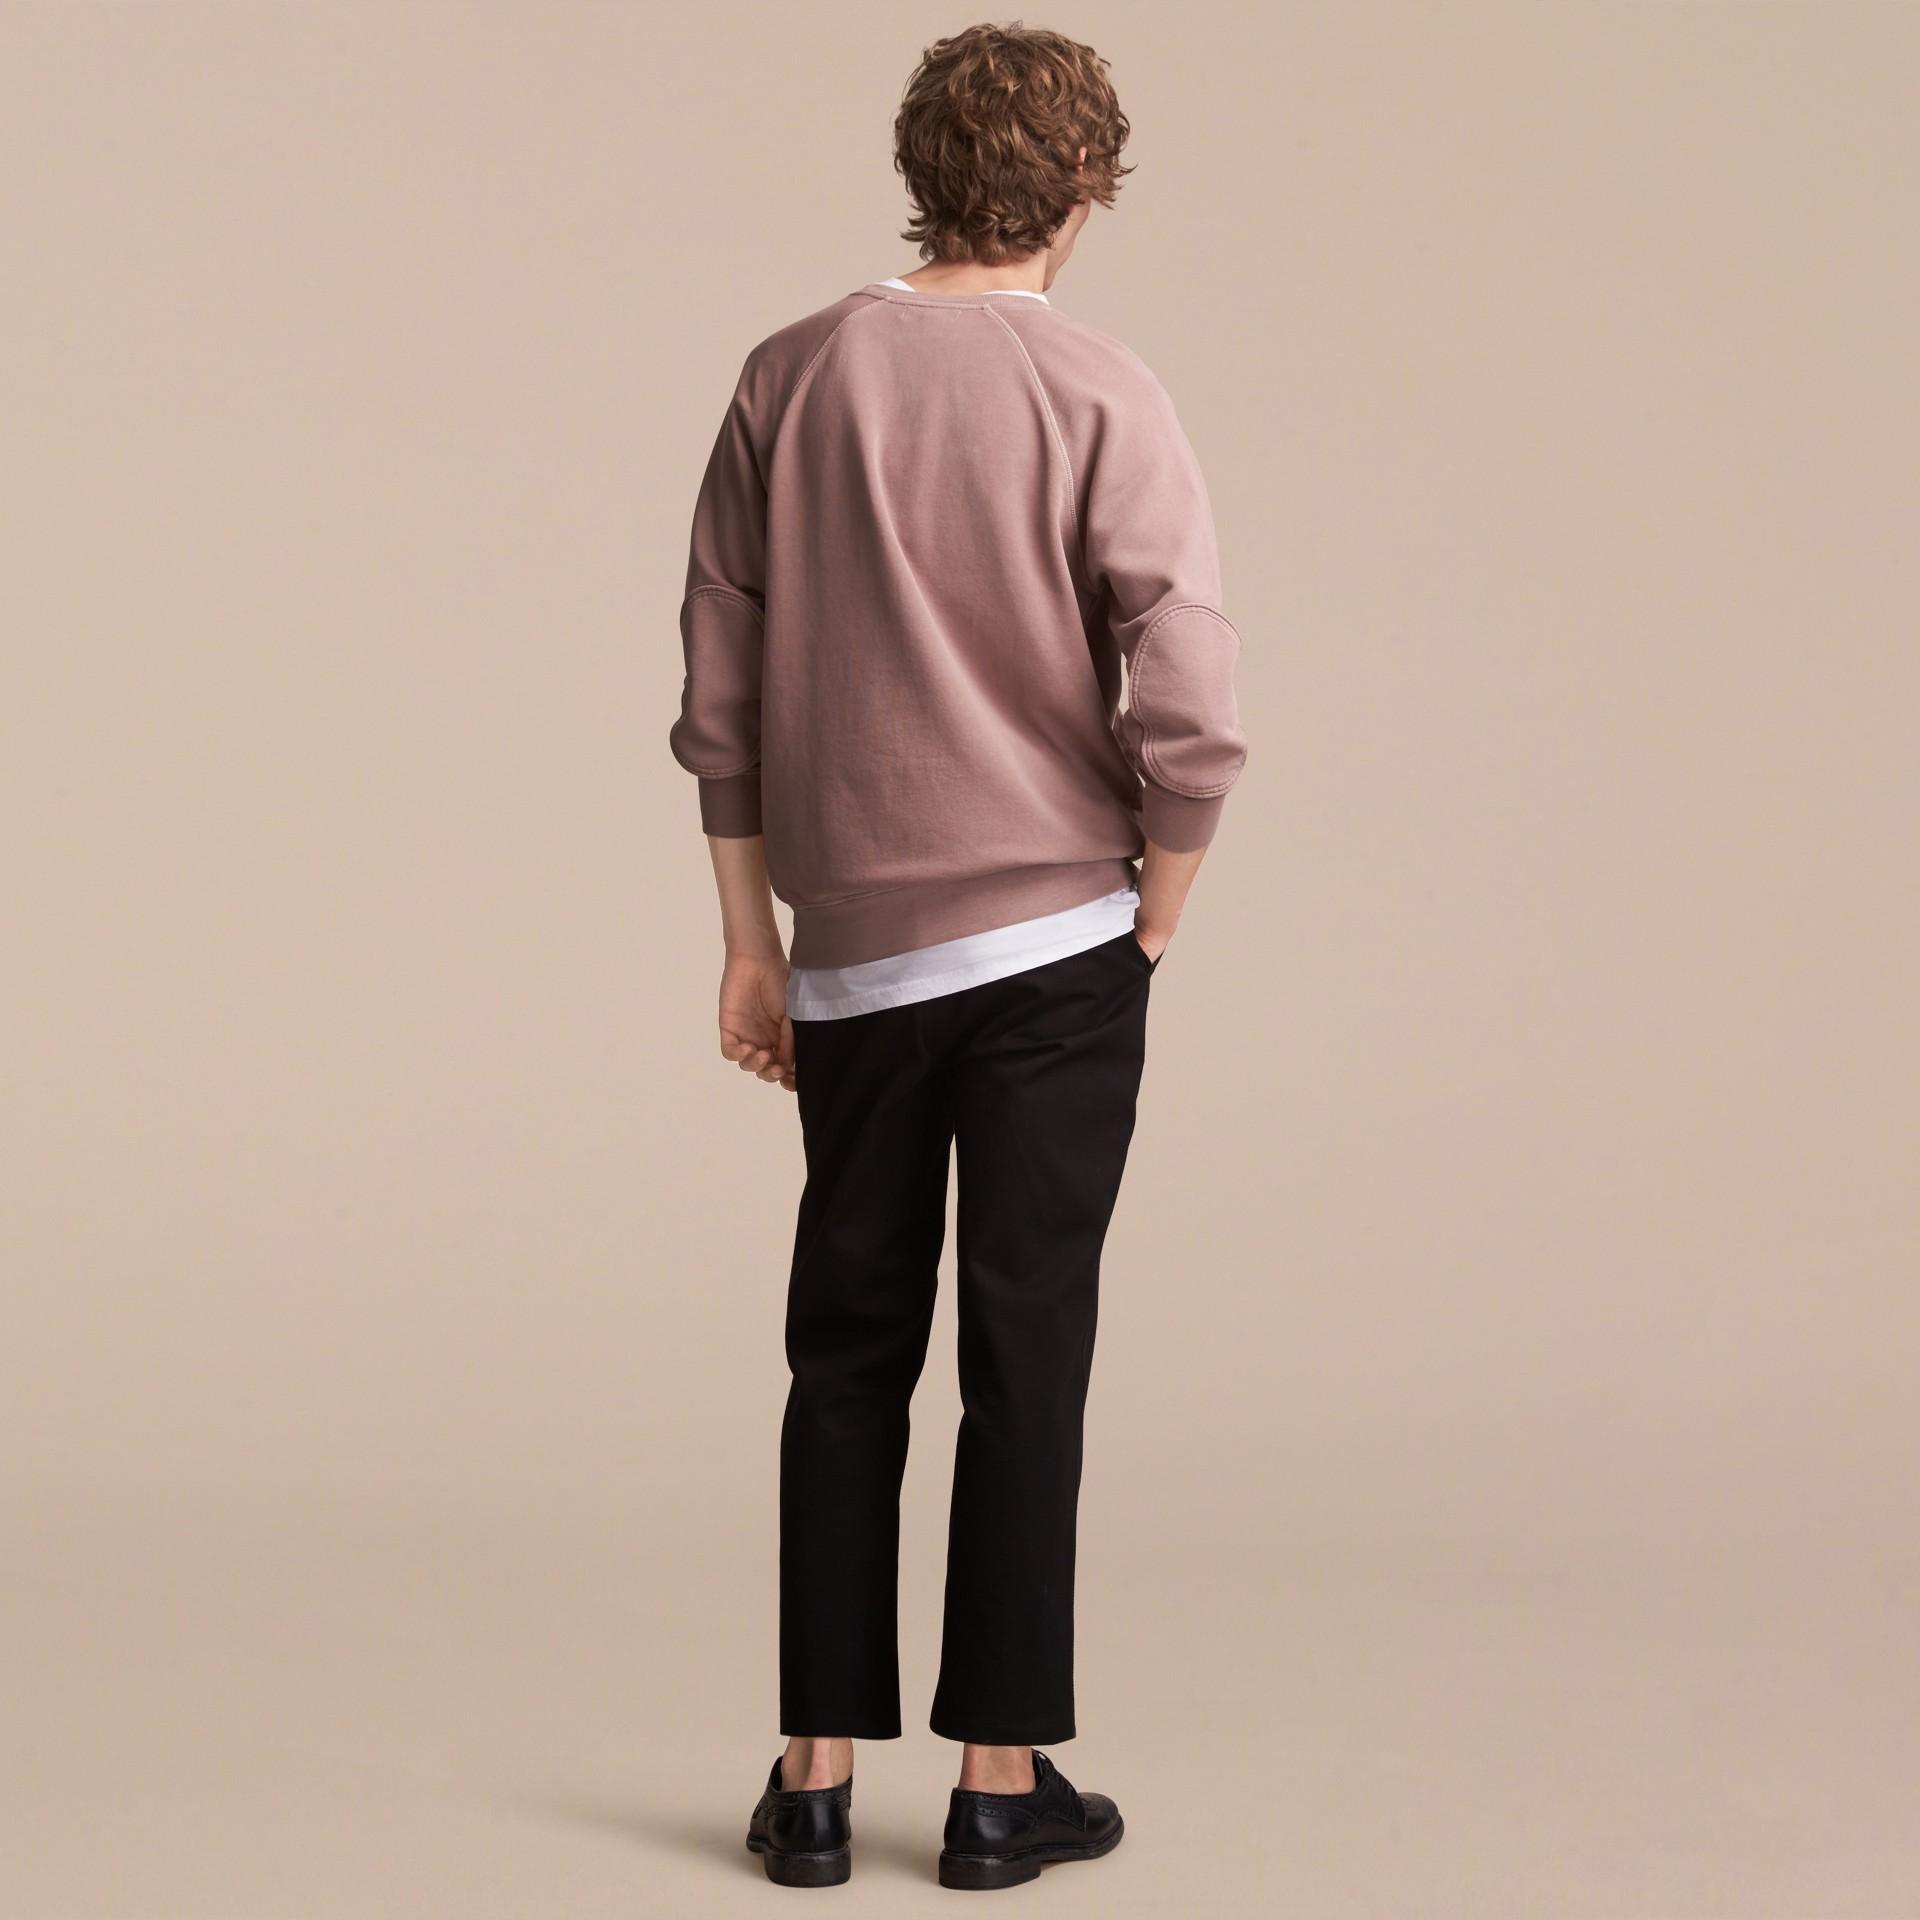 Unisex Pigment-dyed Cotton Oversize Sweatshirt Dusty Mauve - gallery image 3